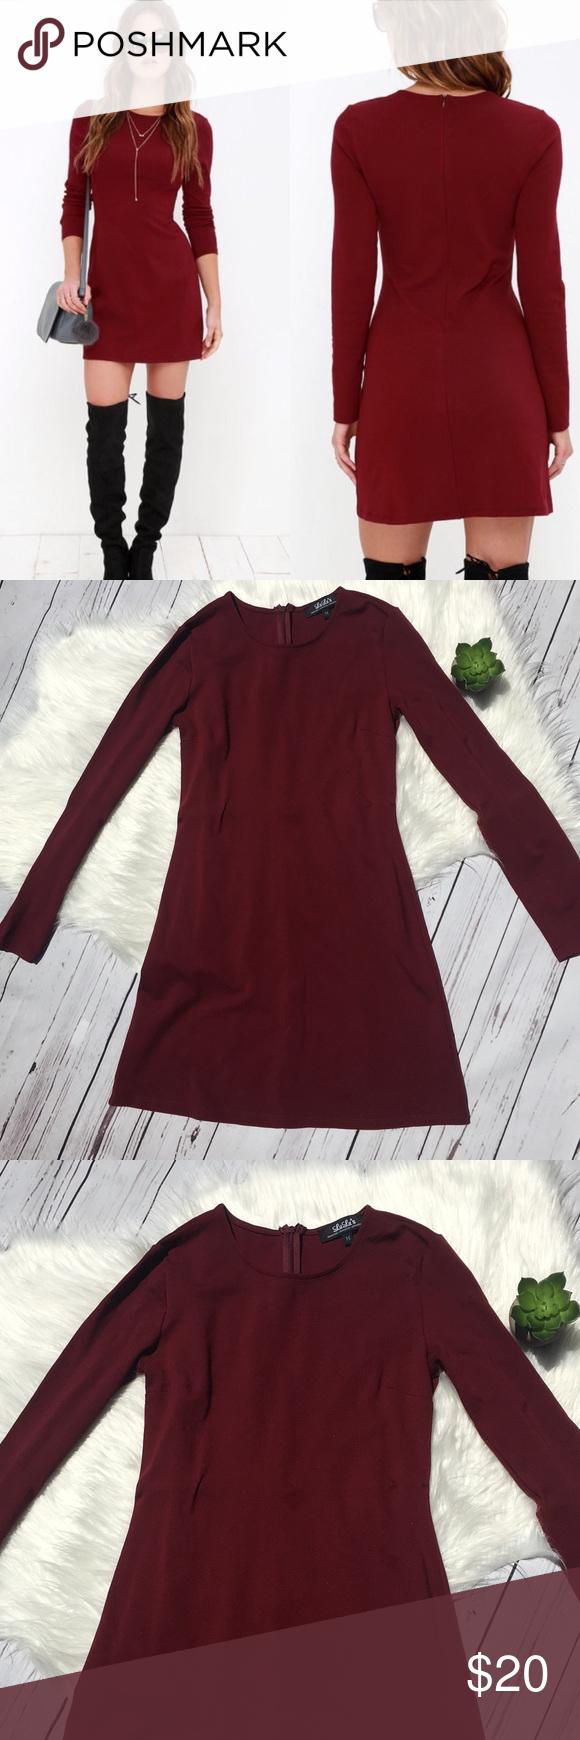 Luluus perfectly posh long sleeve dress wine red my posh closet